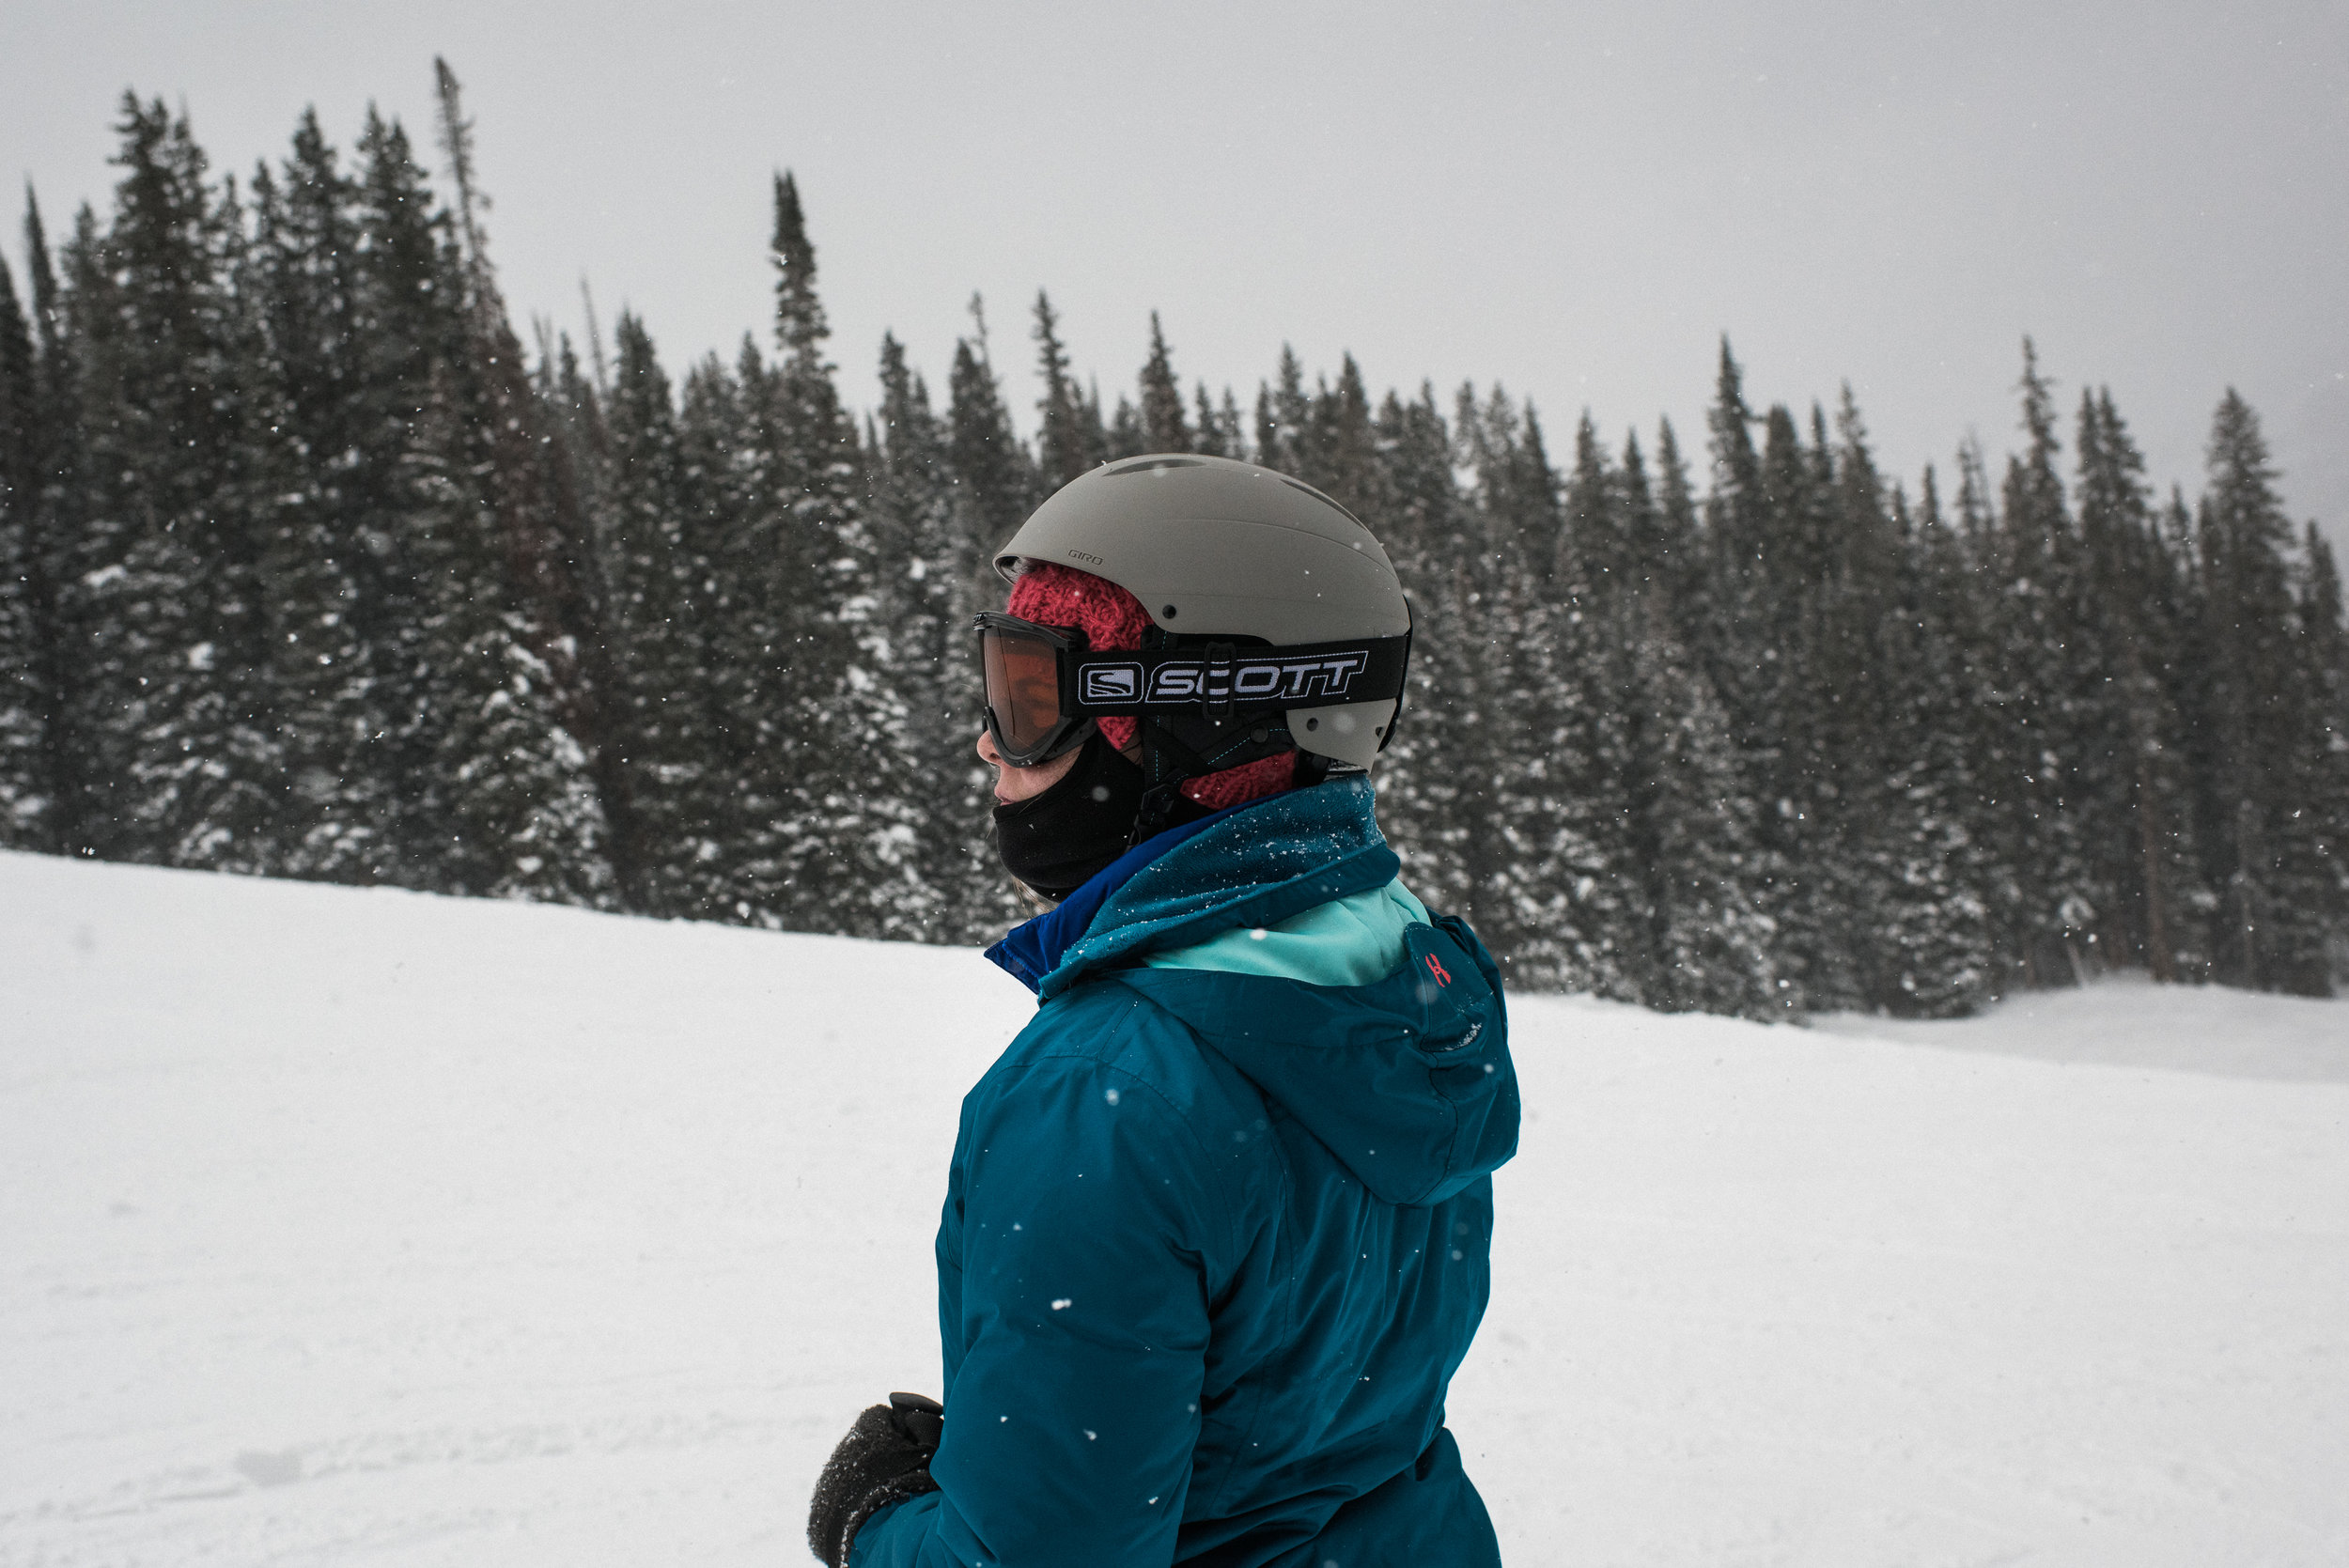 TaraShupe_Outdoor_Photographer_Loweprobags_Colorado_Copper_Mountains_Ski_13.jpg